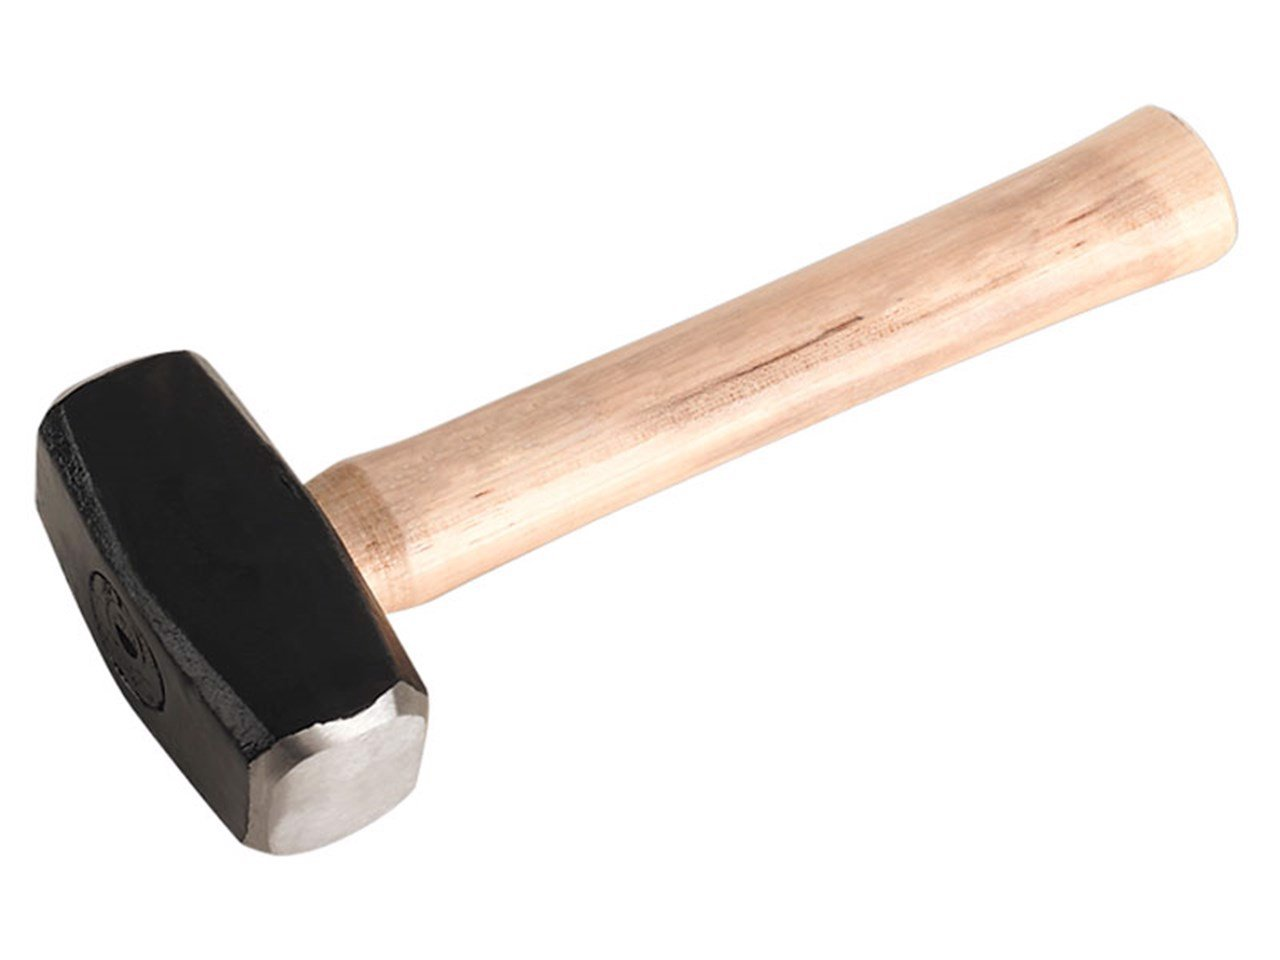 Búa sắt cầm tay 3kg